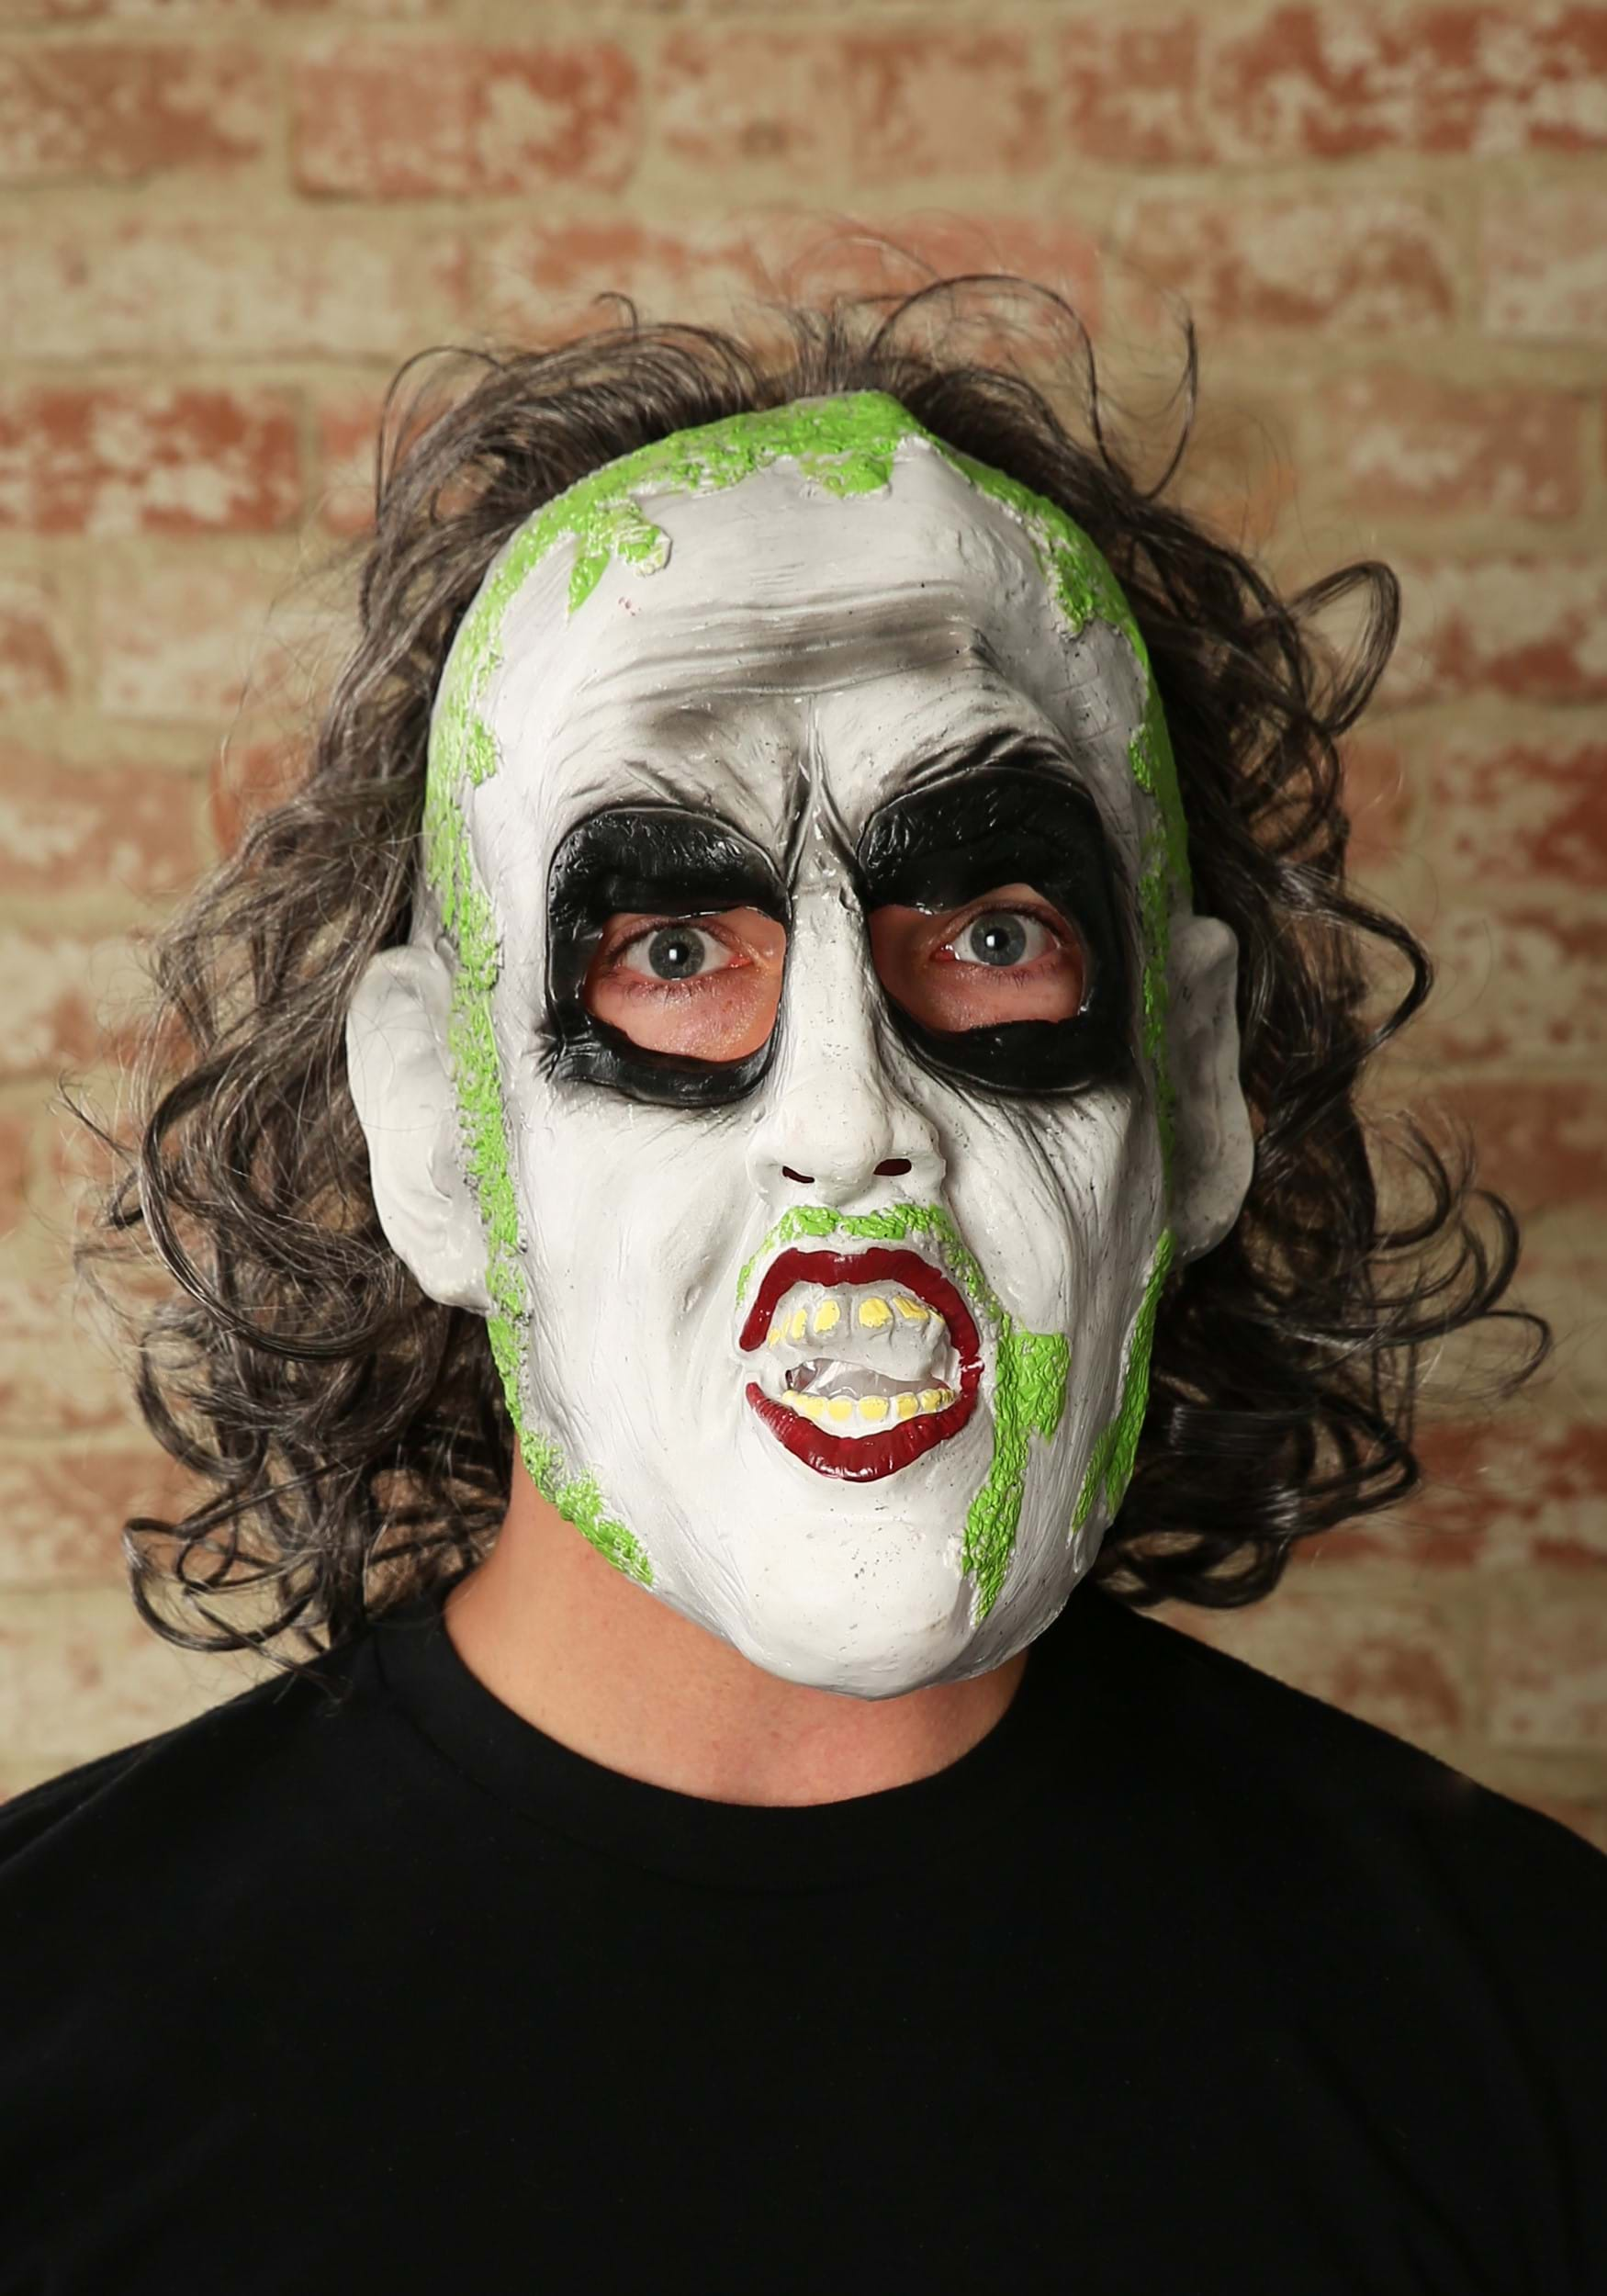 Scary Masks - Horror Movie Masks, Scary Clown Masks